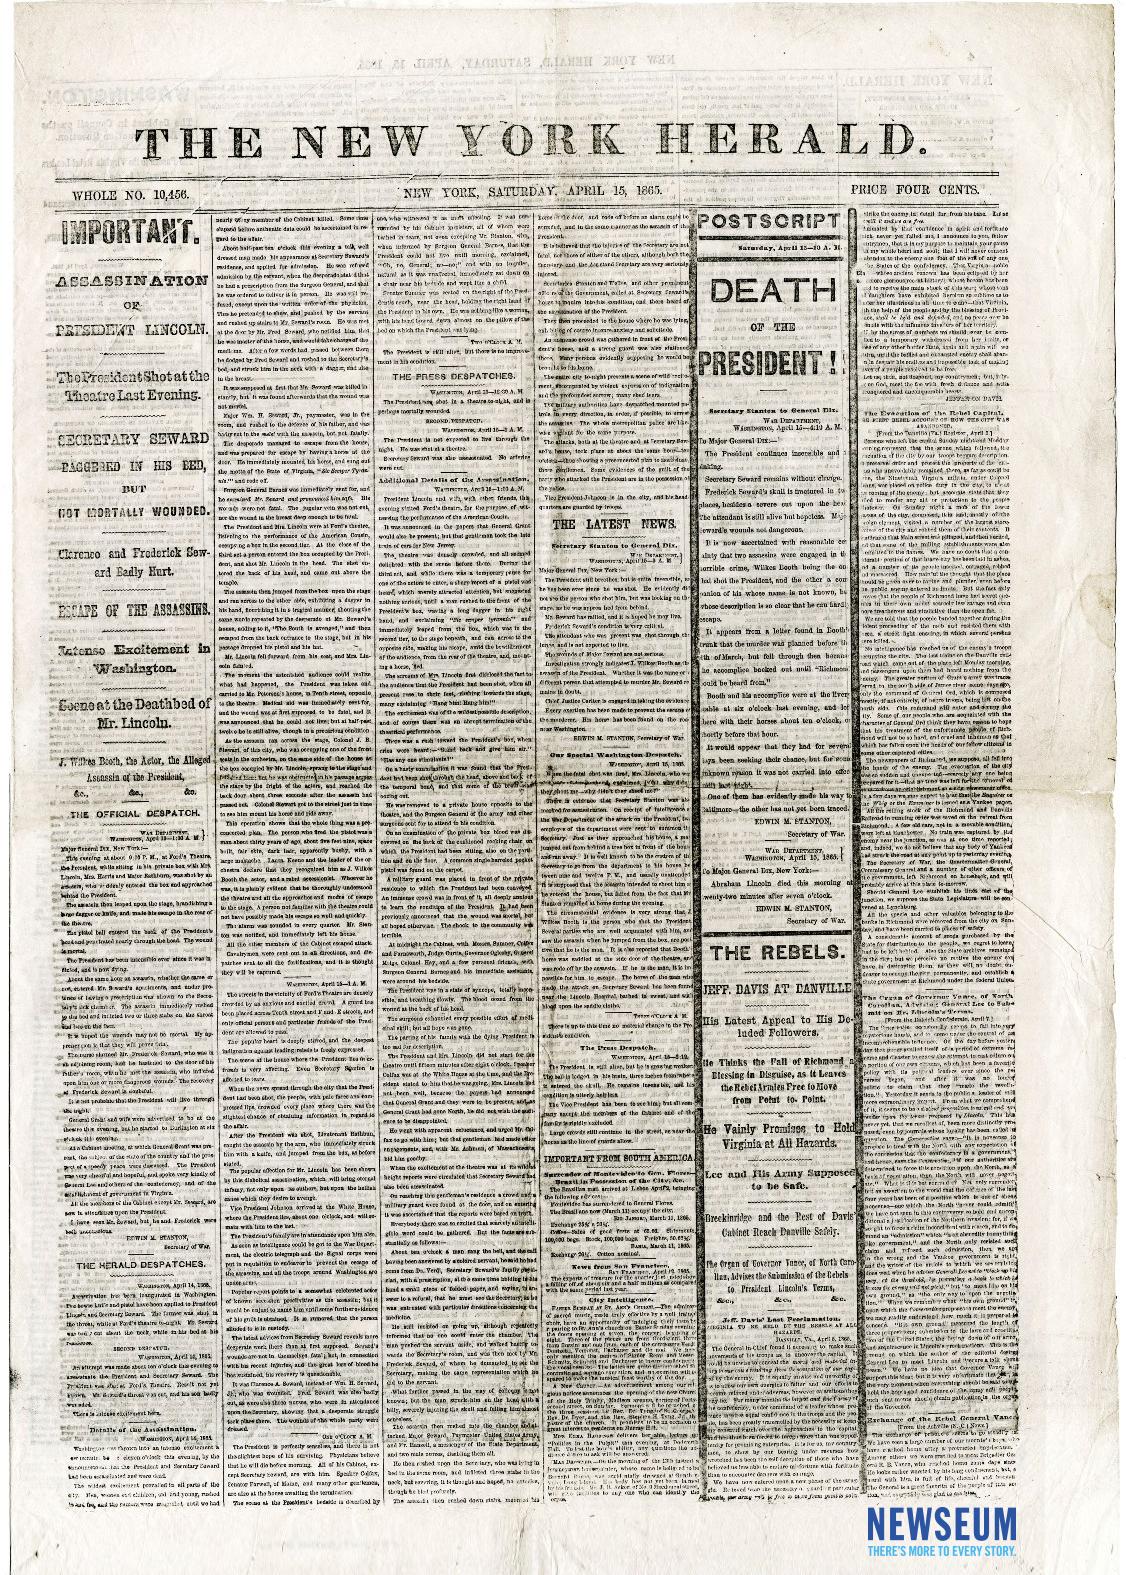 The New York Herald, April 15, 1865